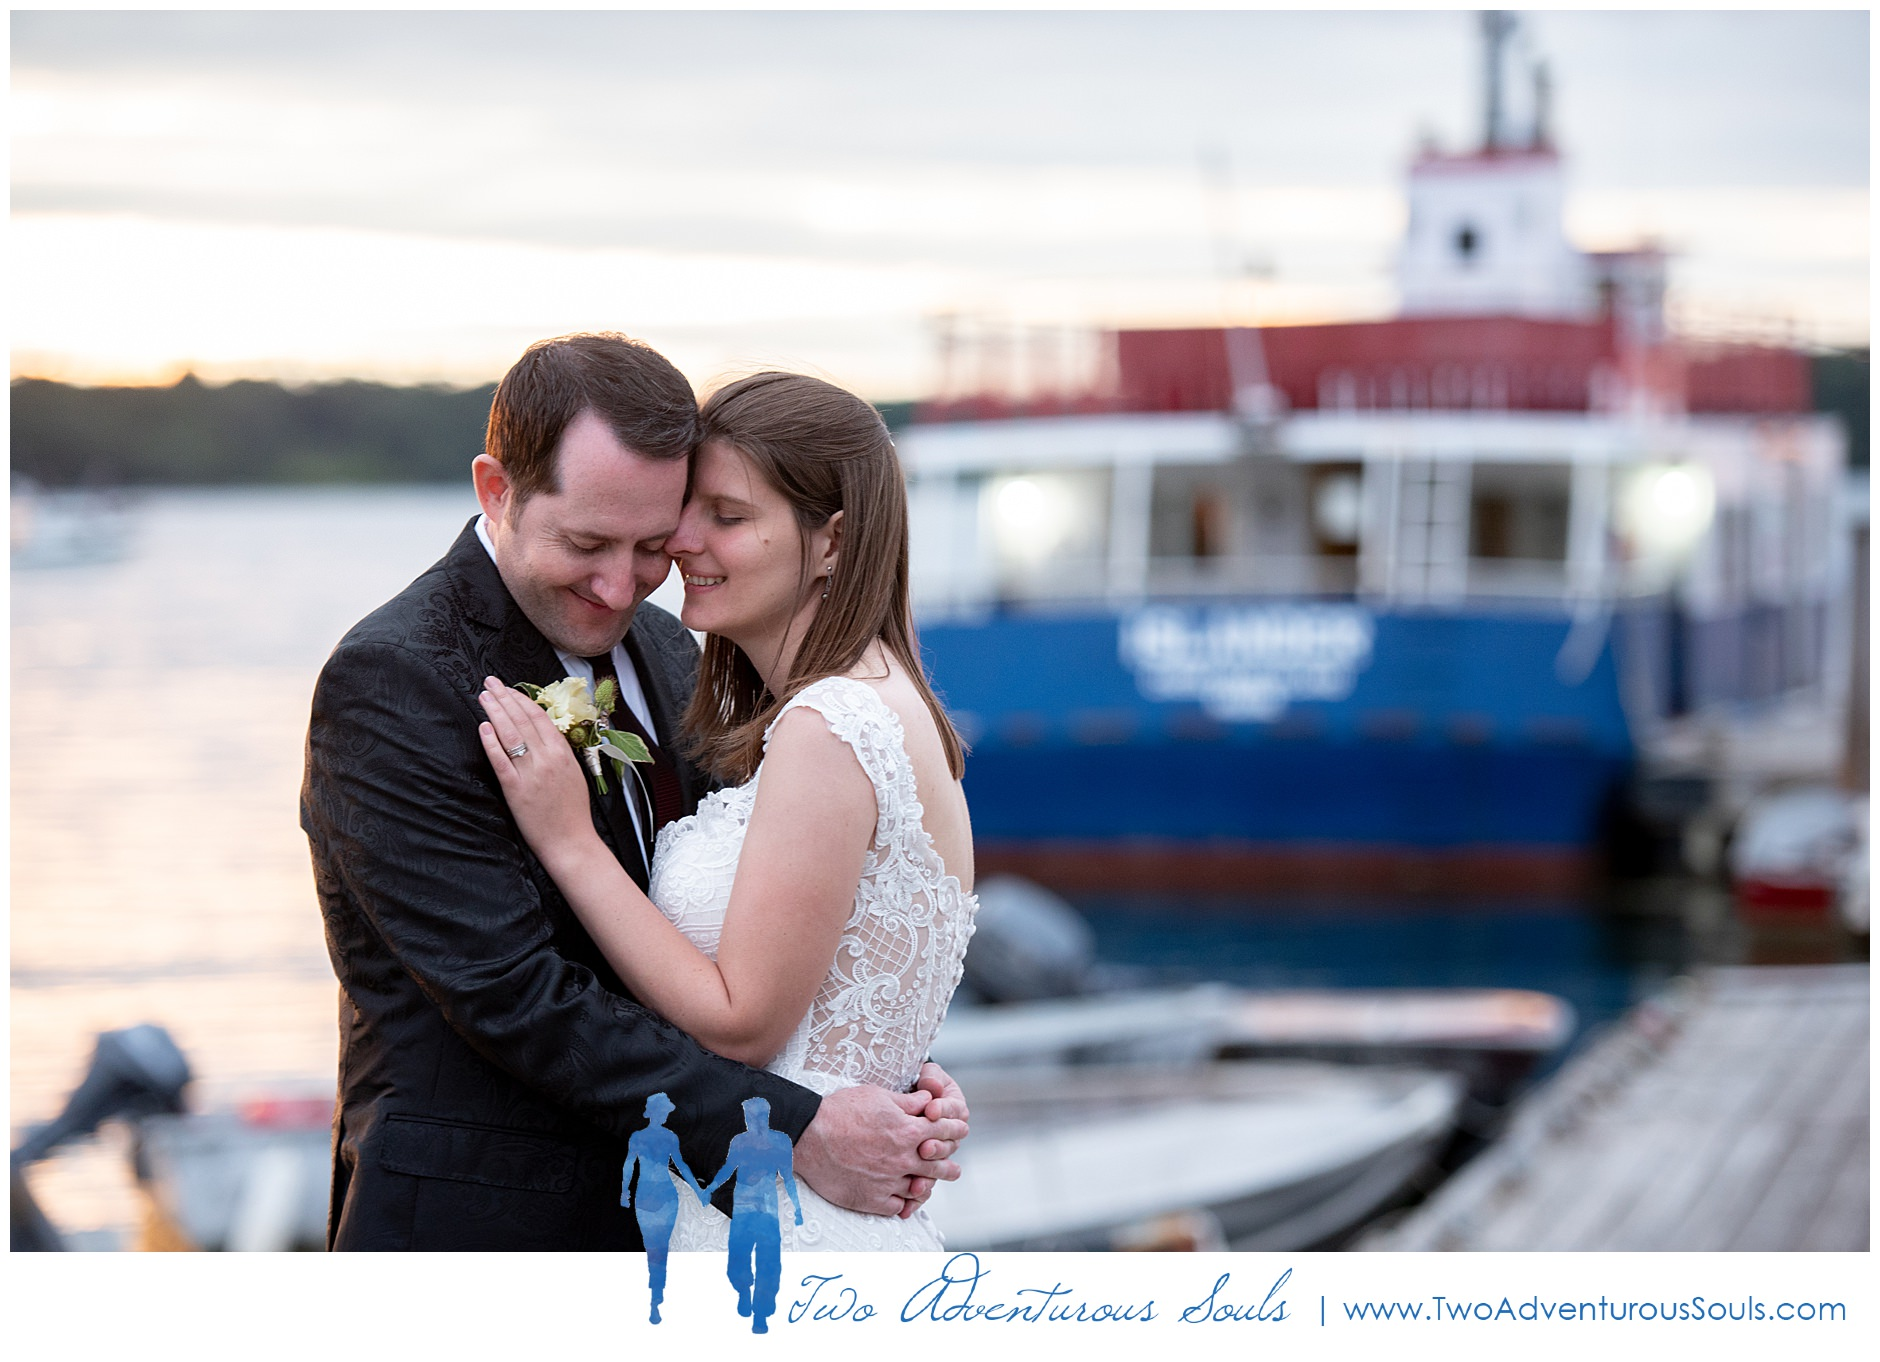 Chebeague Island Inn Wedding Photograpehrs, Maine Wedding Photographers, Two Adventurous Souls-082419_0021.jpg